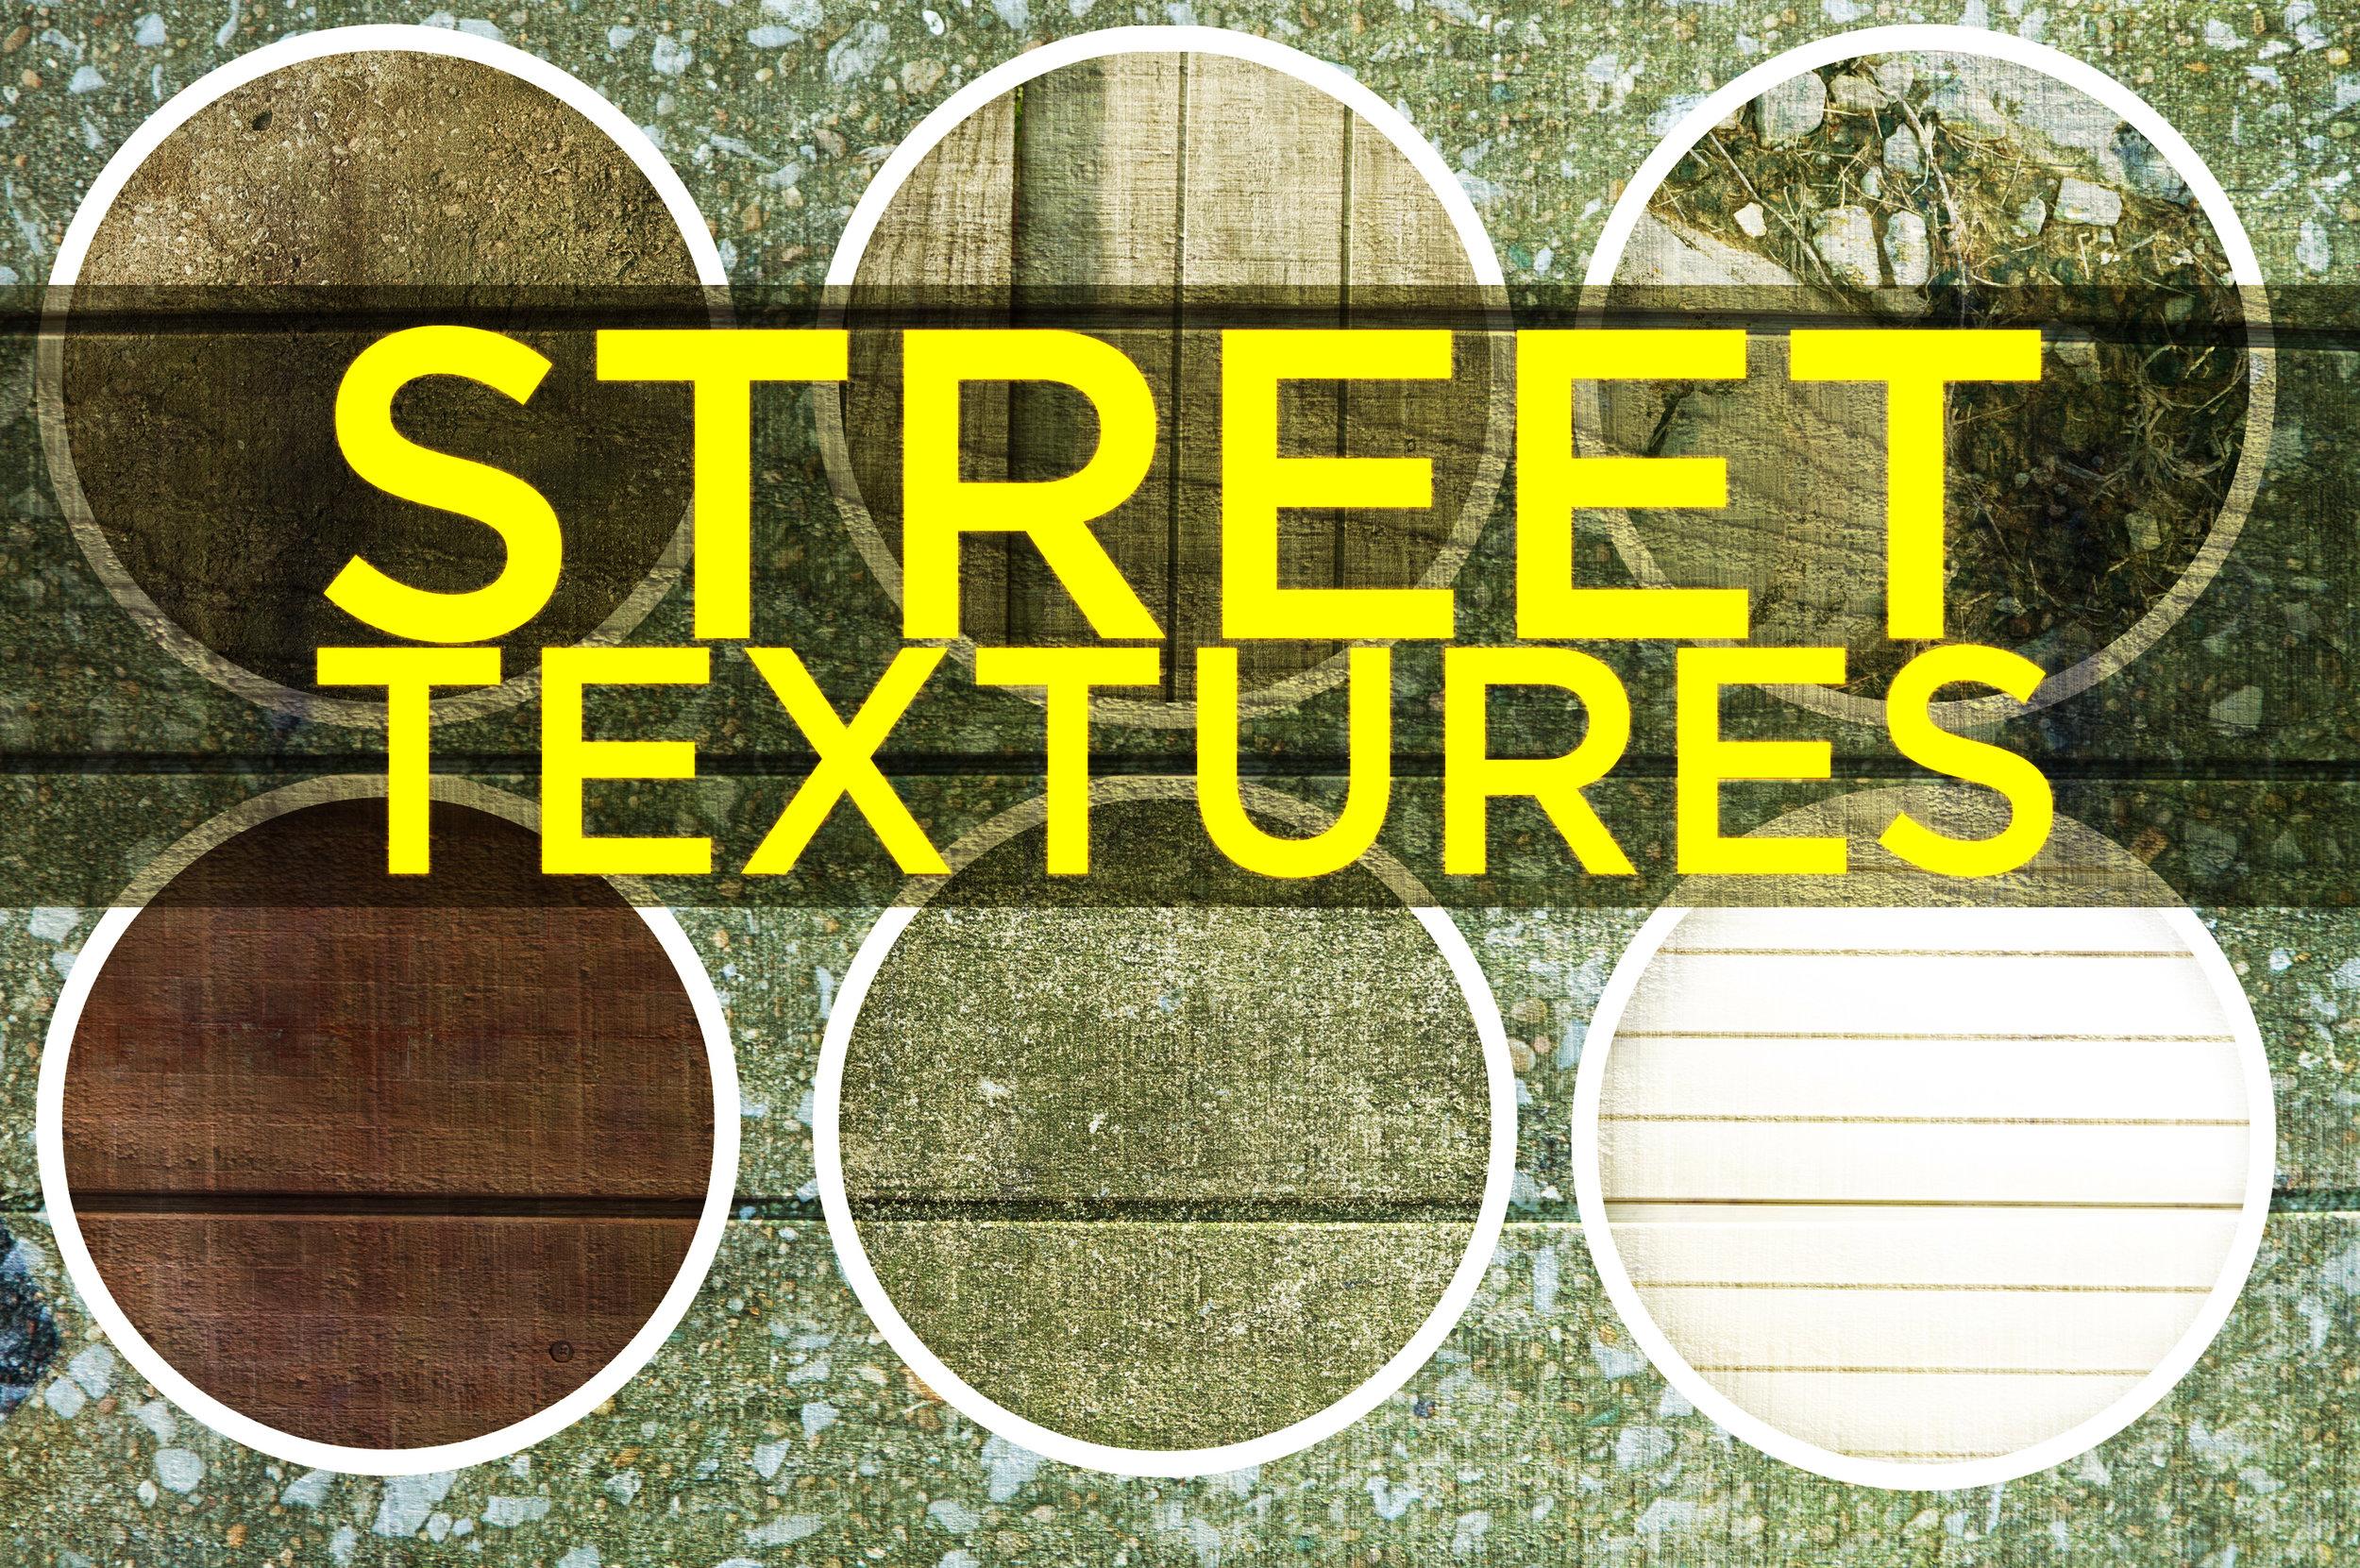 StreetTexturesLogo.jpg